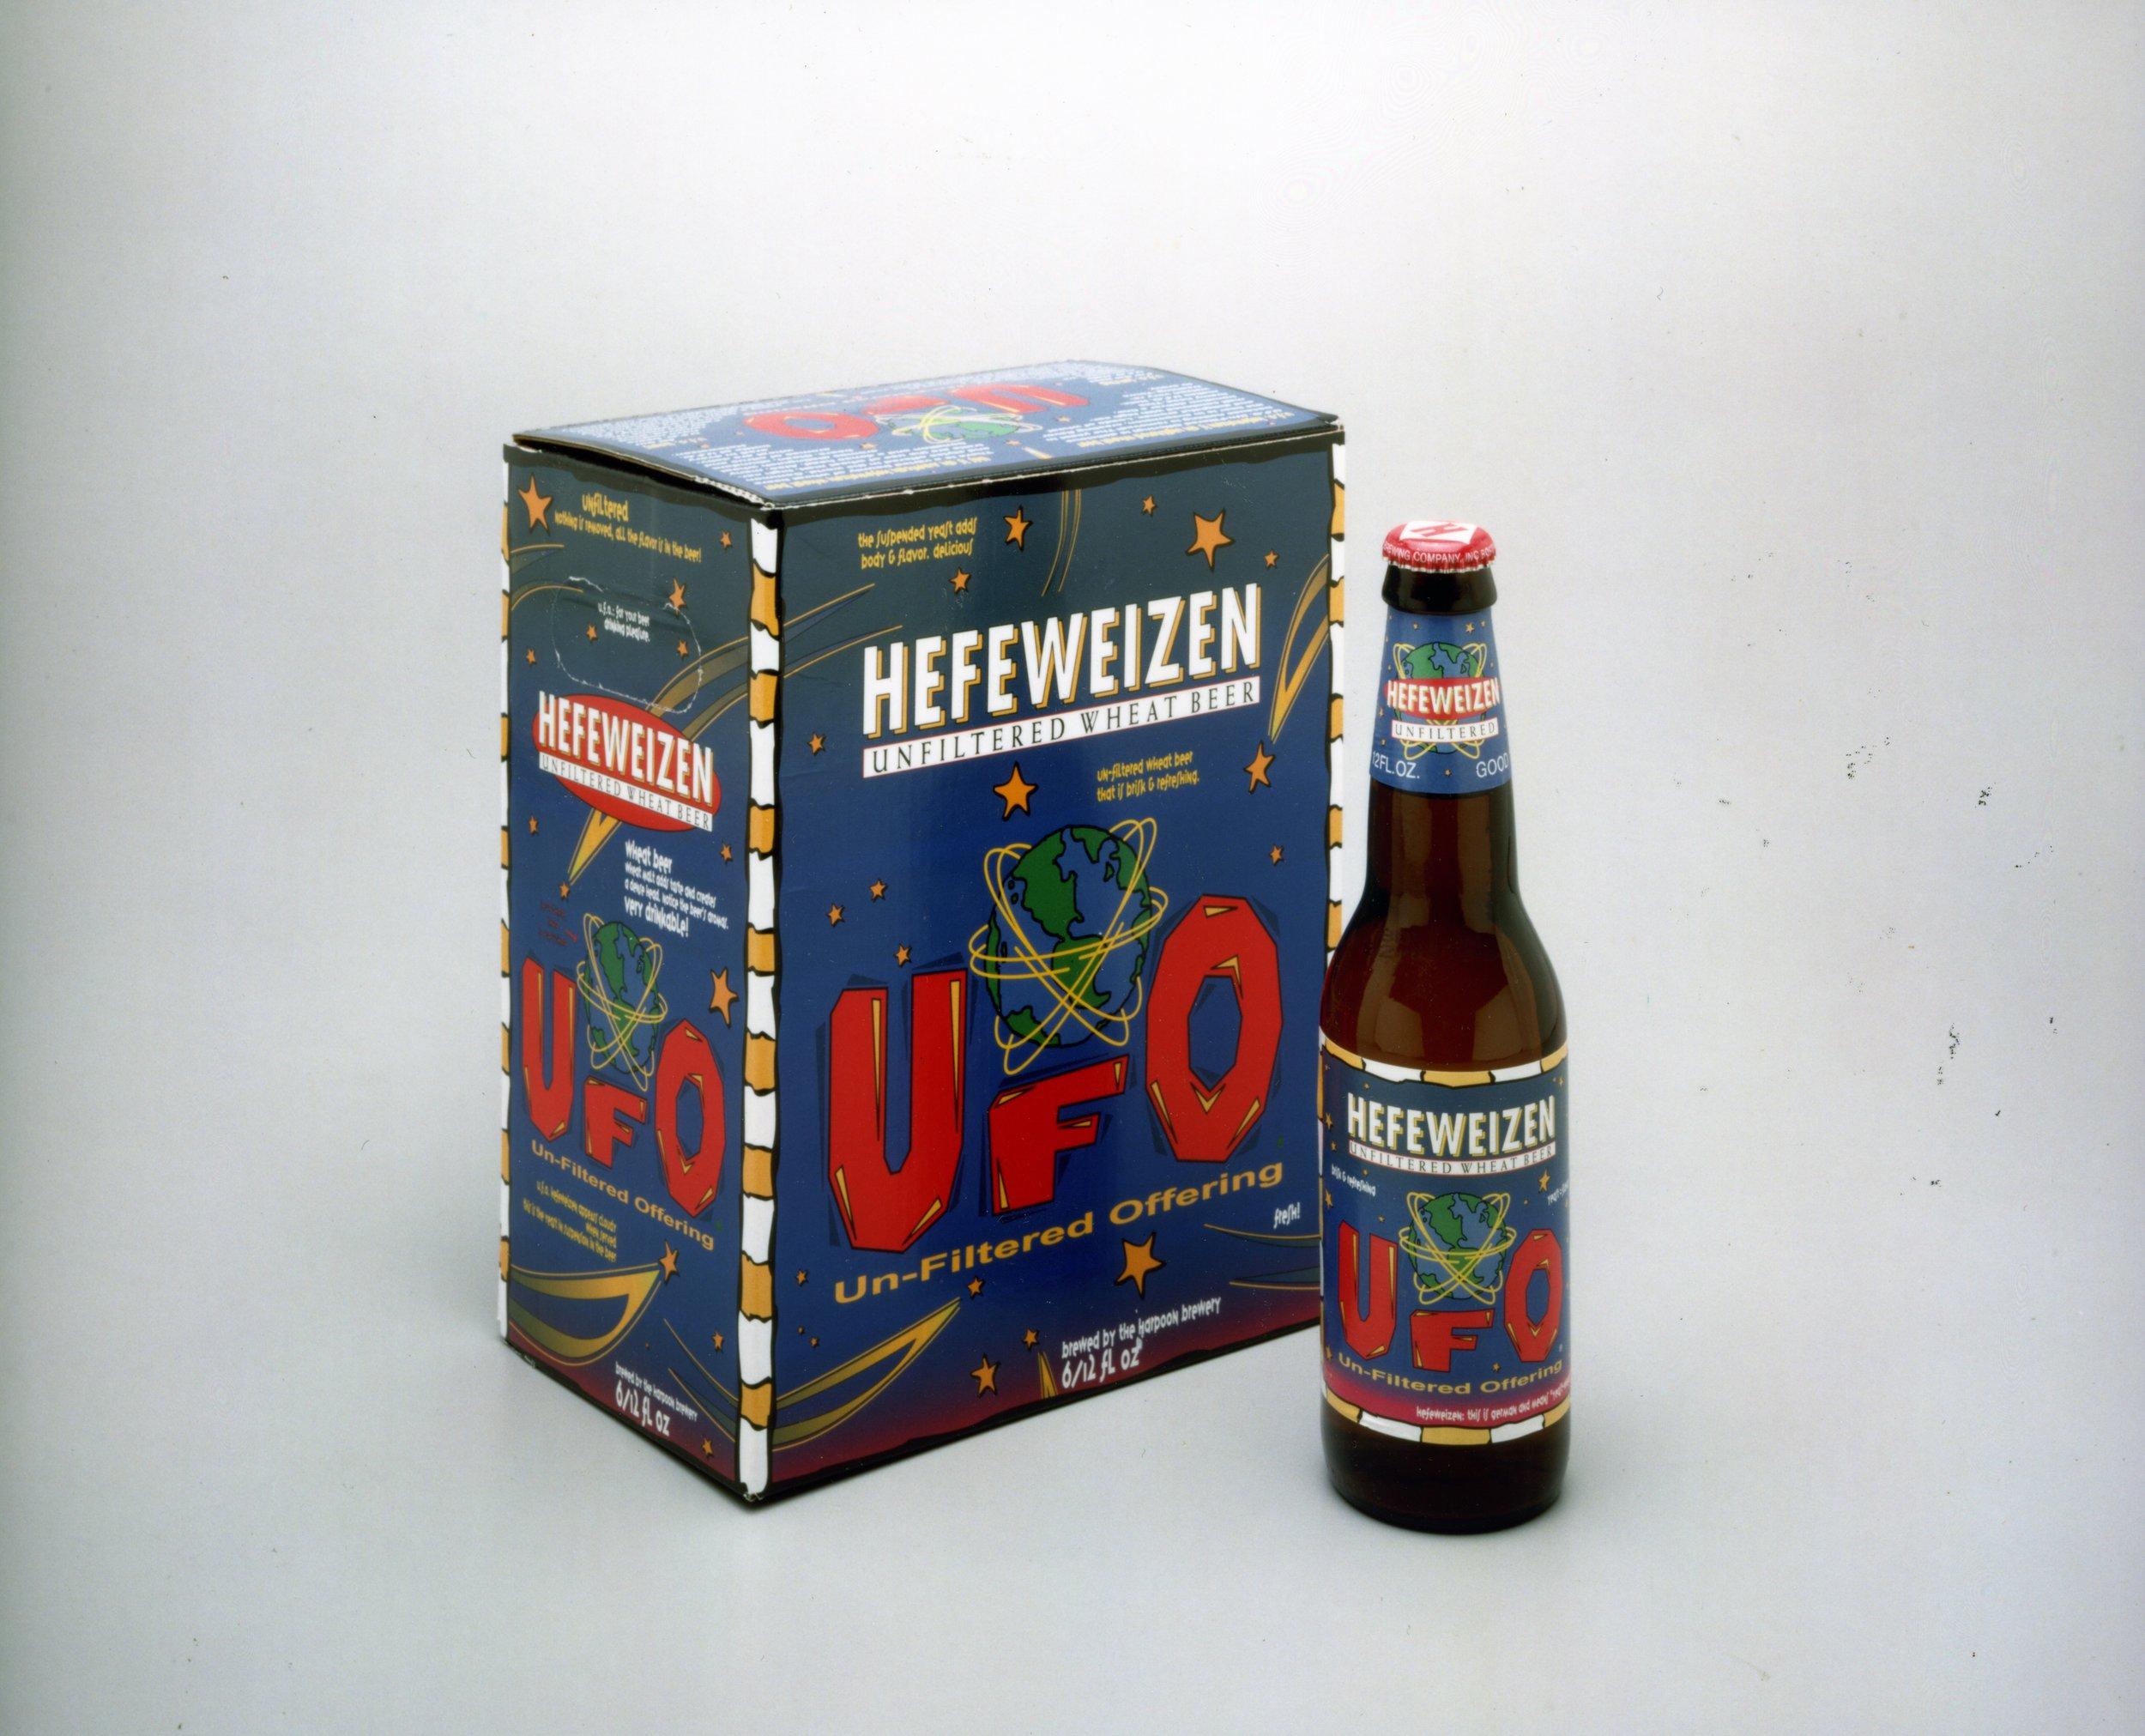 "UFO ""Hefeweizen"" packaging, 1998. Photo courtesy of Harpoon Brewery."